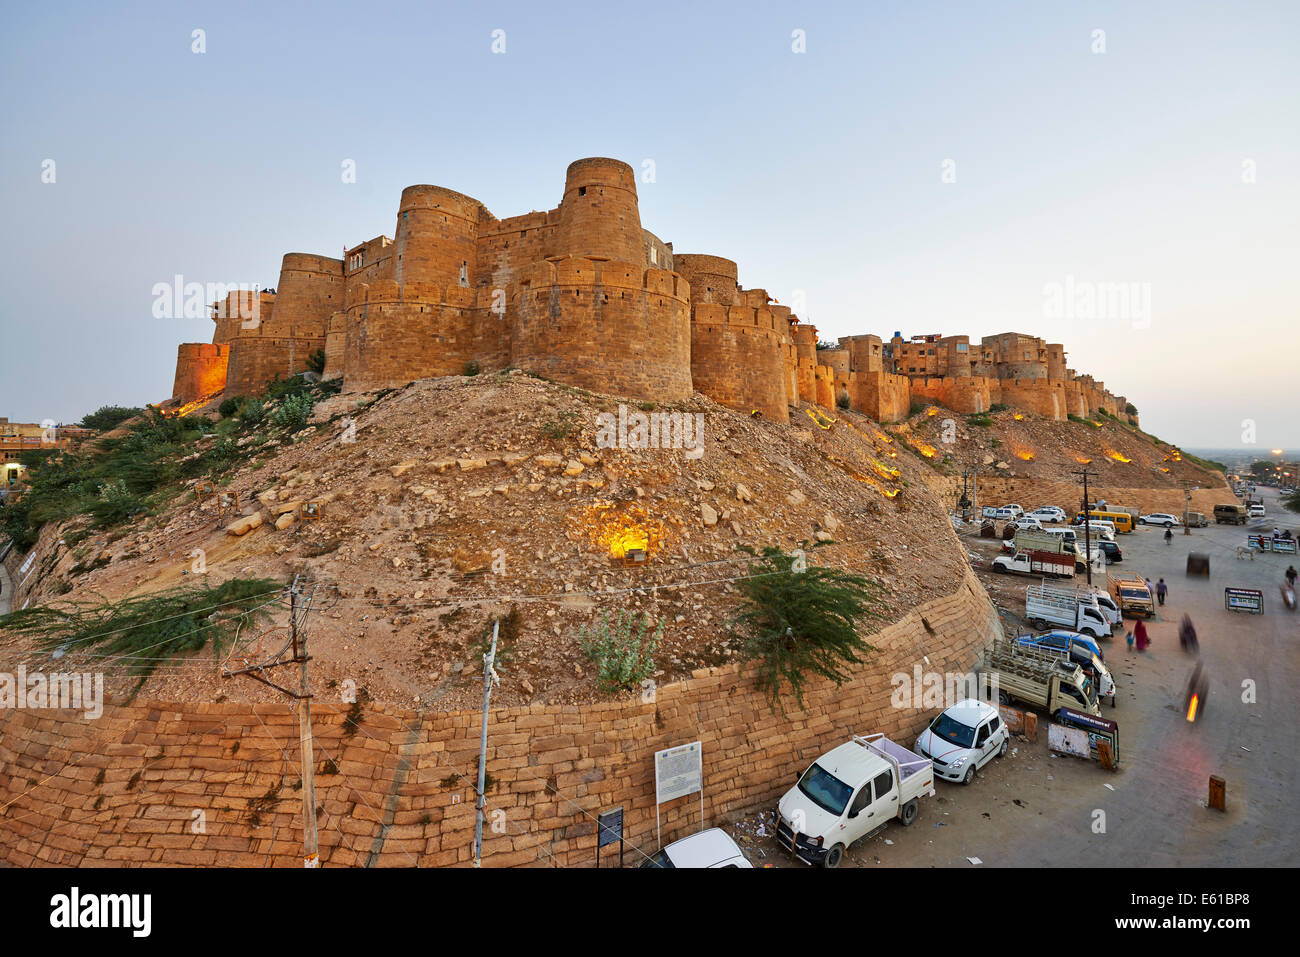 city wall of Jaisalmer, Rajasthan, India, Asia - Stock Image